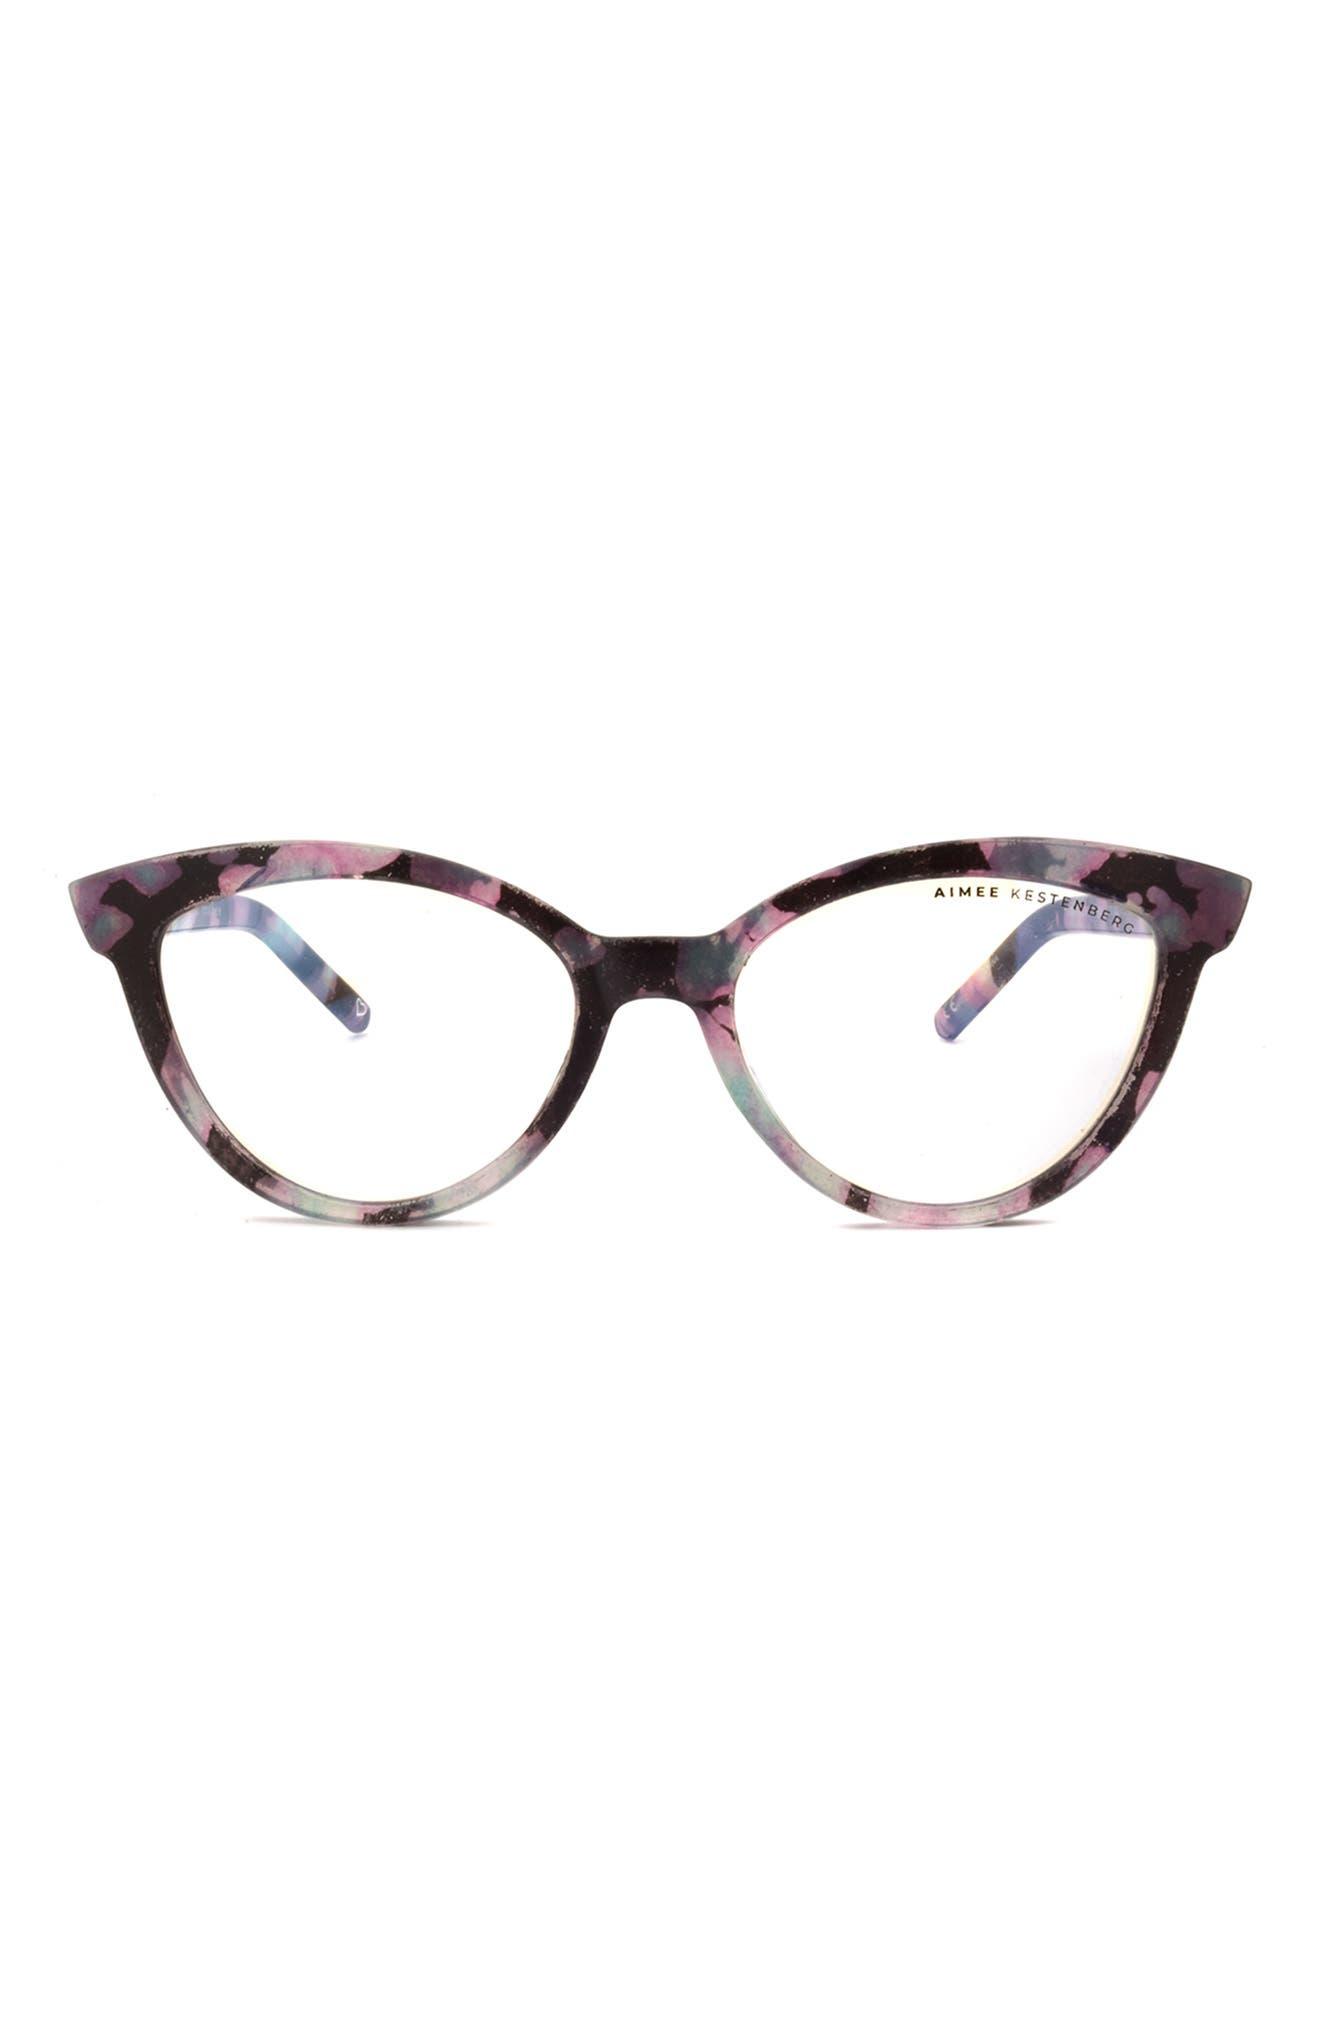 Madison 52mm Cat Eye Blue Light Blocking Glasses